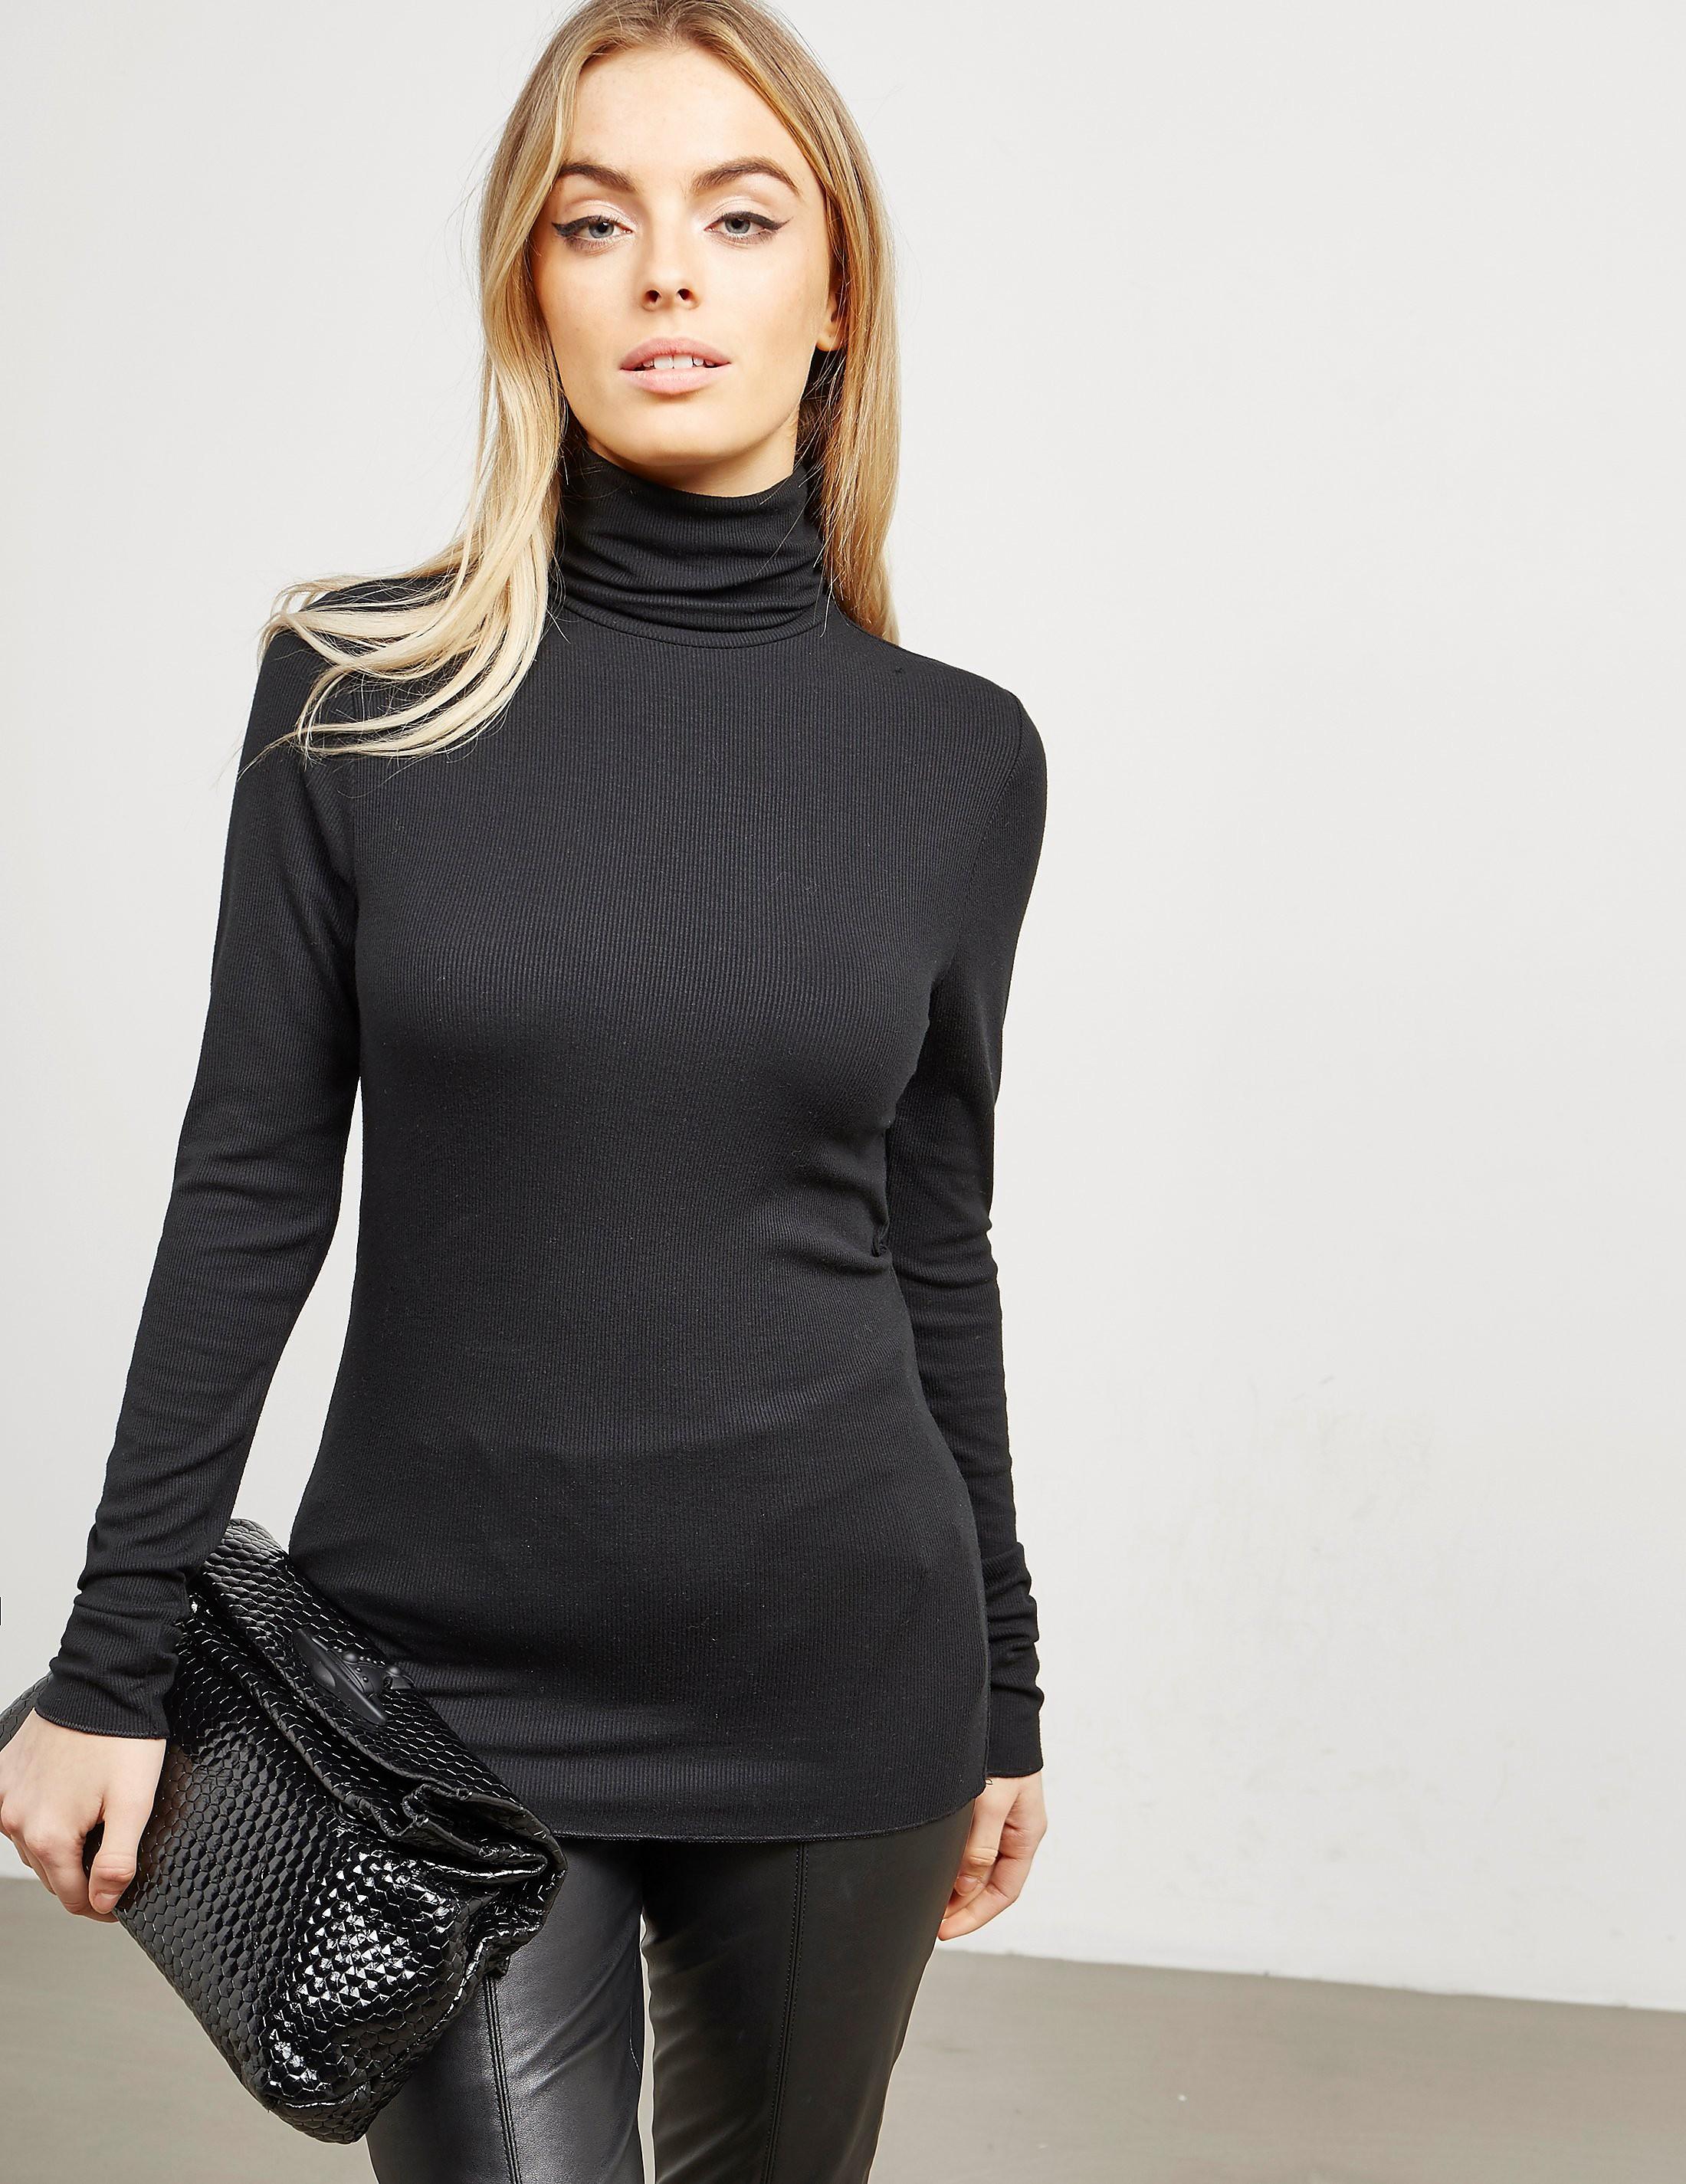 Vivienne Westwood Eva Clutch Bag